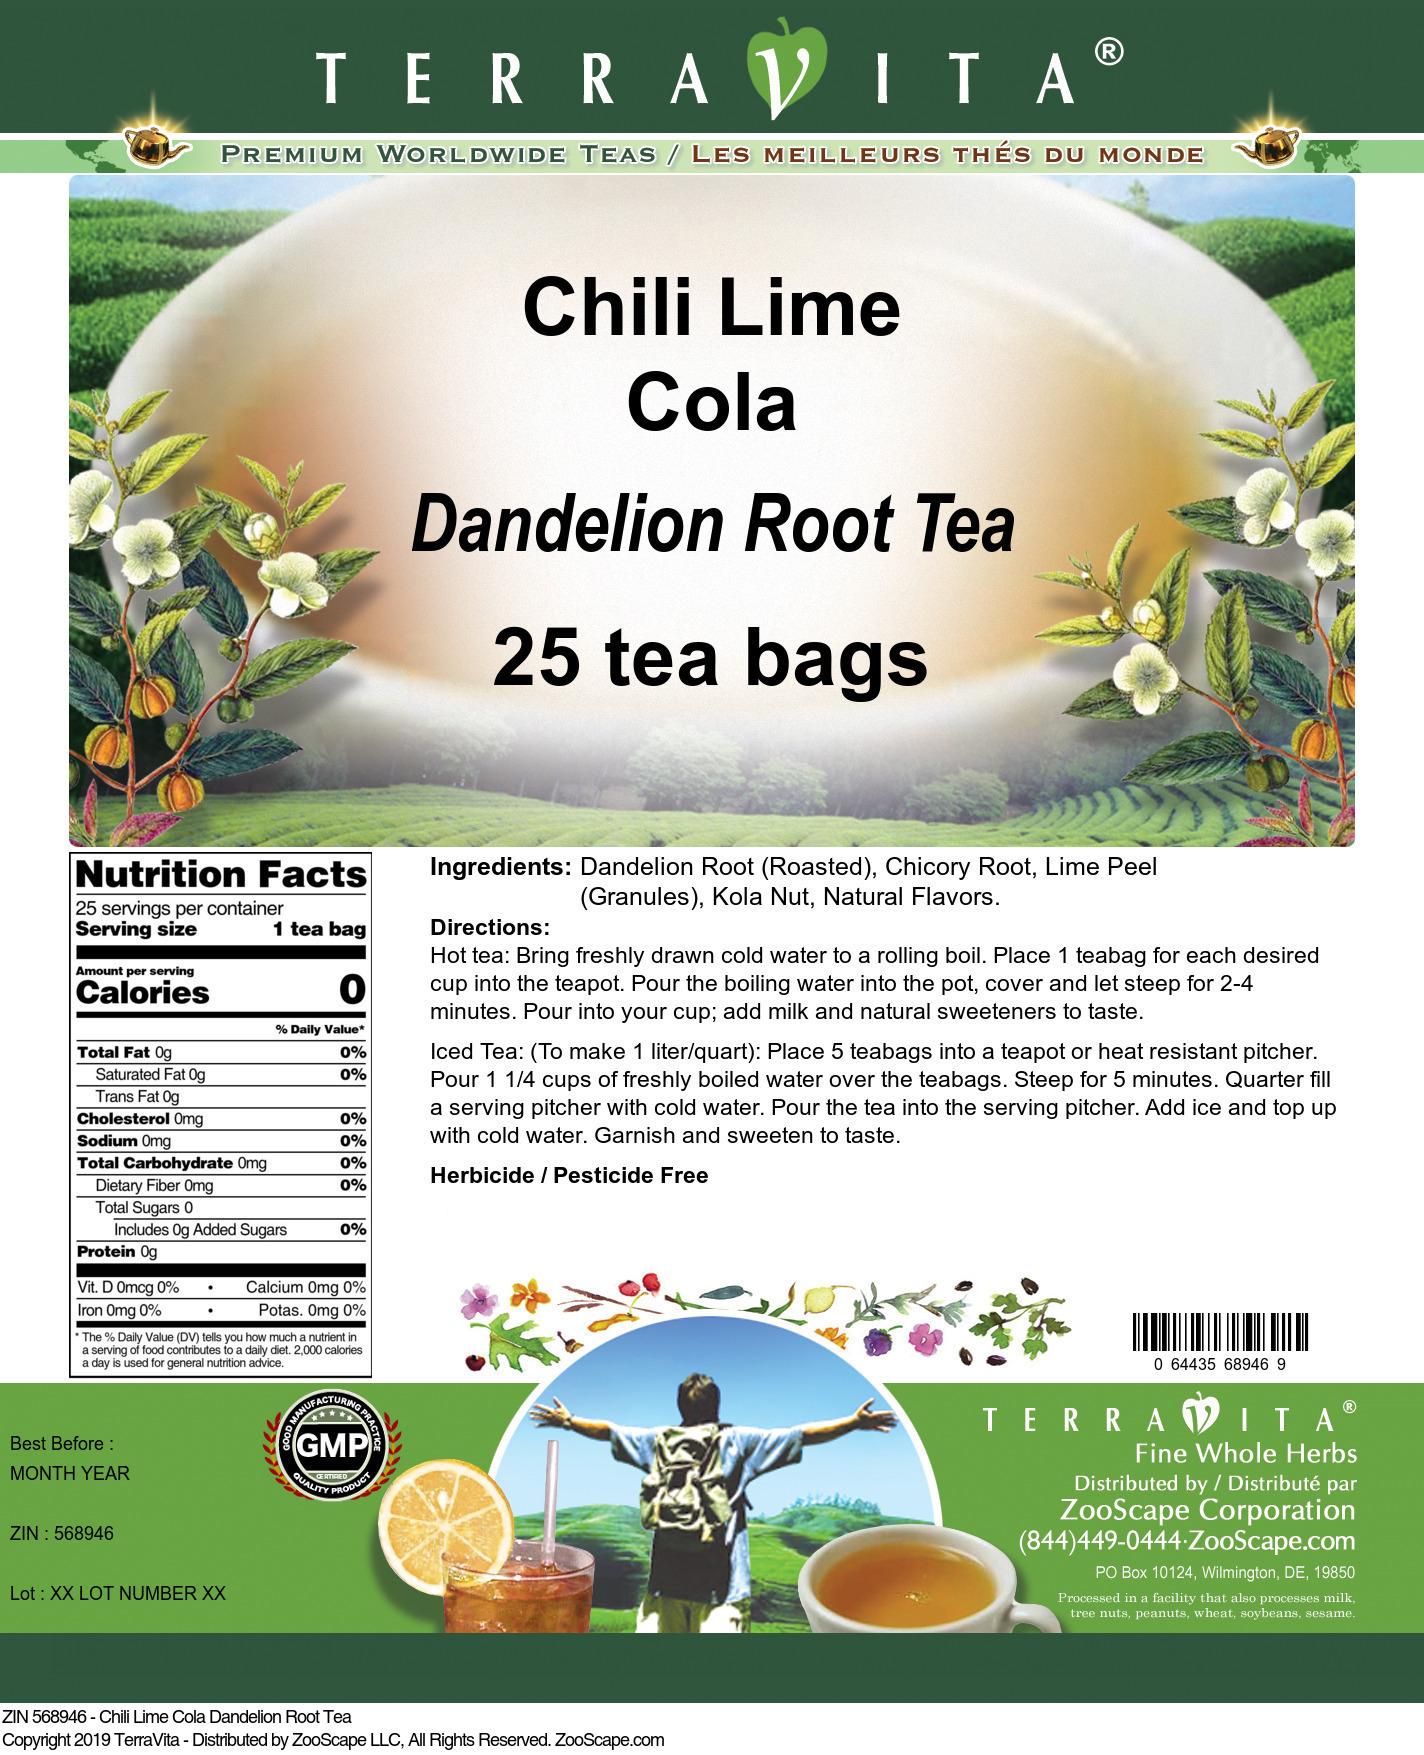 Chili Lime Cola Dandelion Root